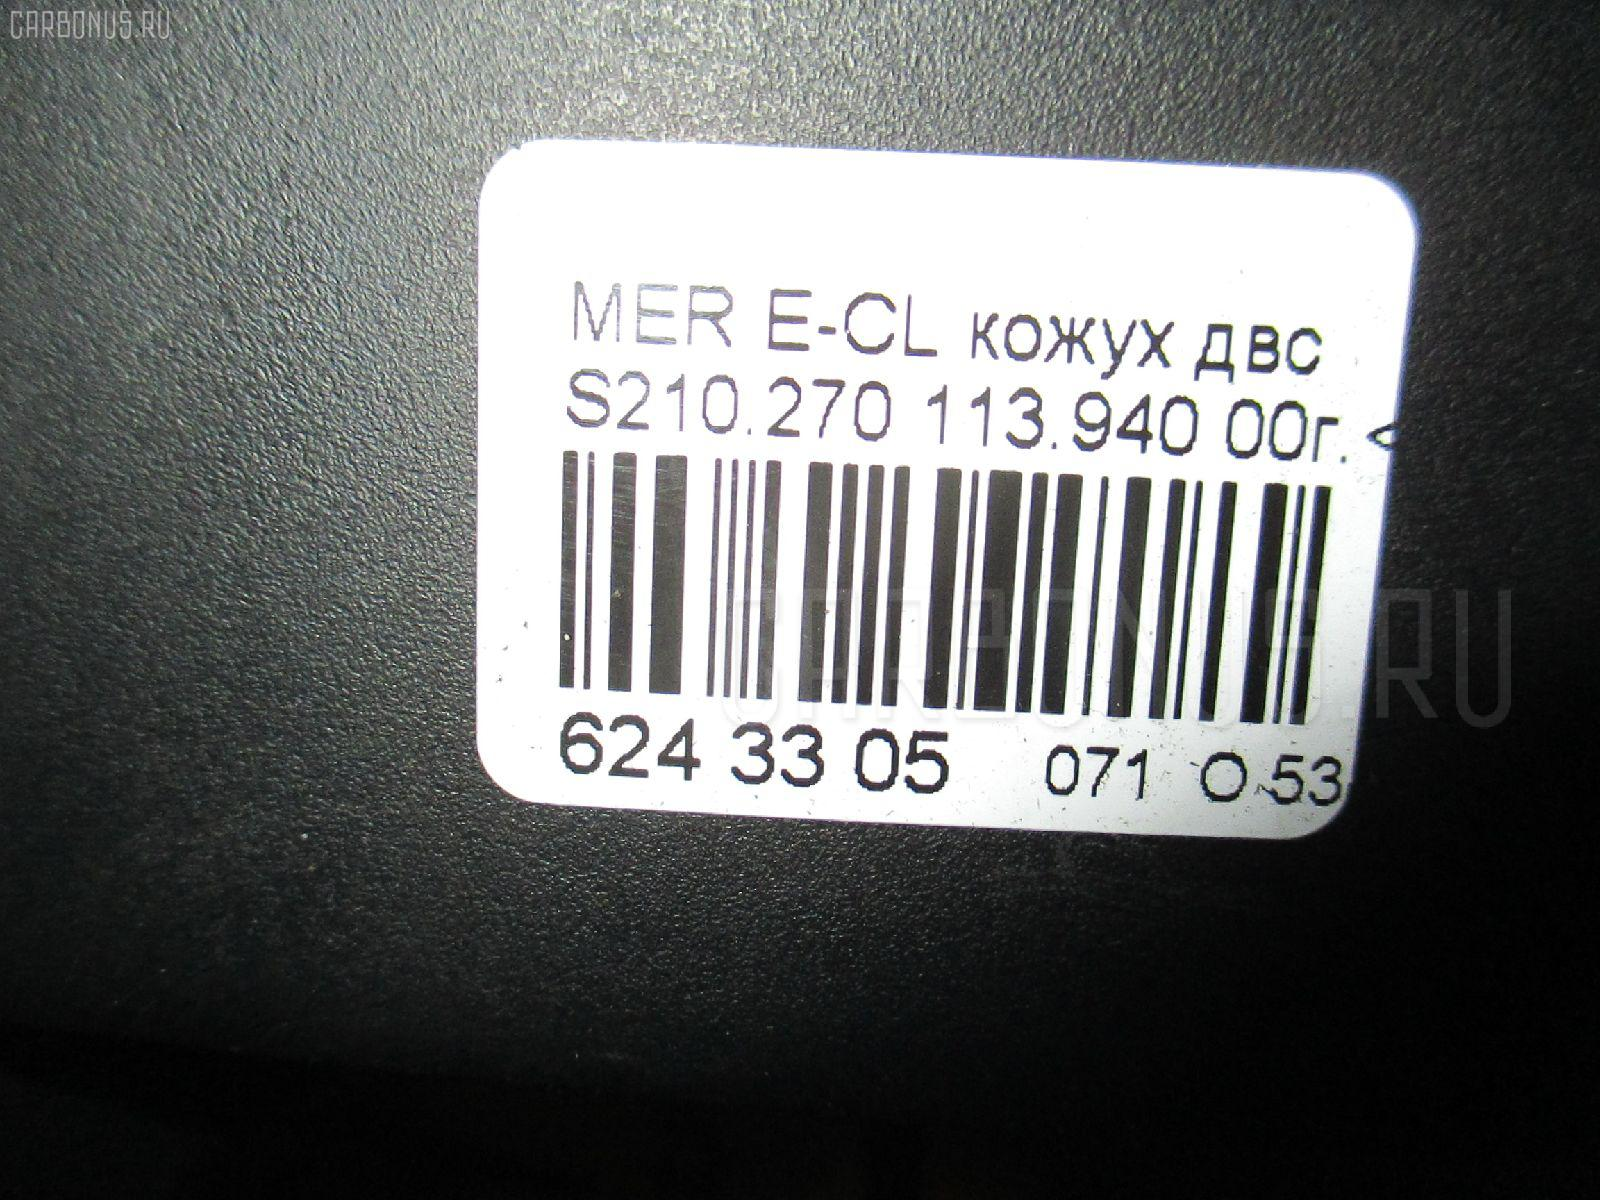 Кожух ДВС MERCEDES-BENZ E-CLASS STATION WAGON S210.270 113.940 Фото 7